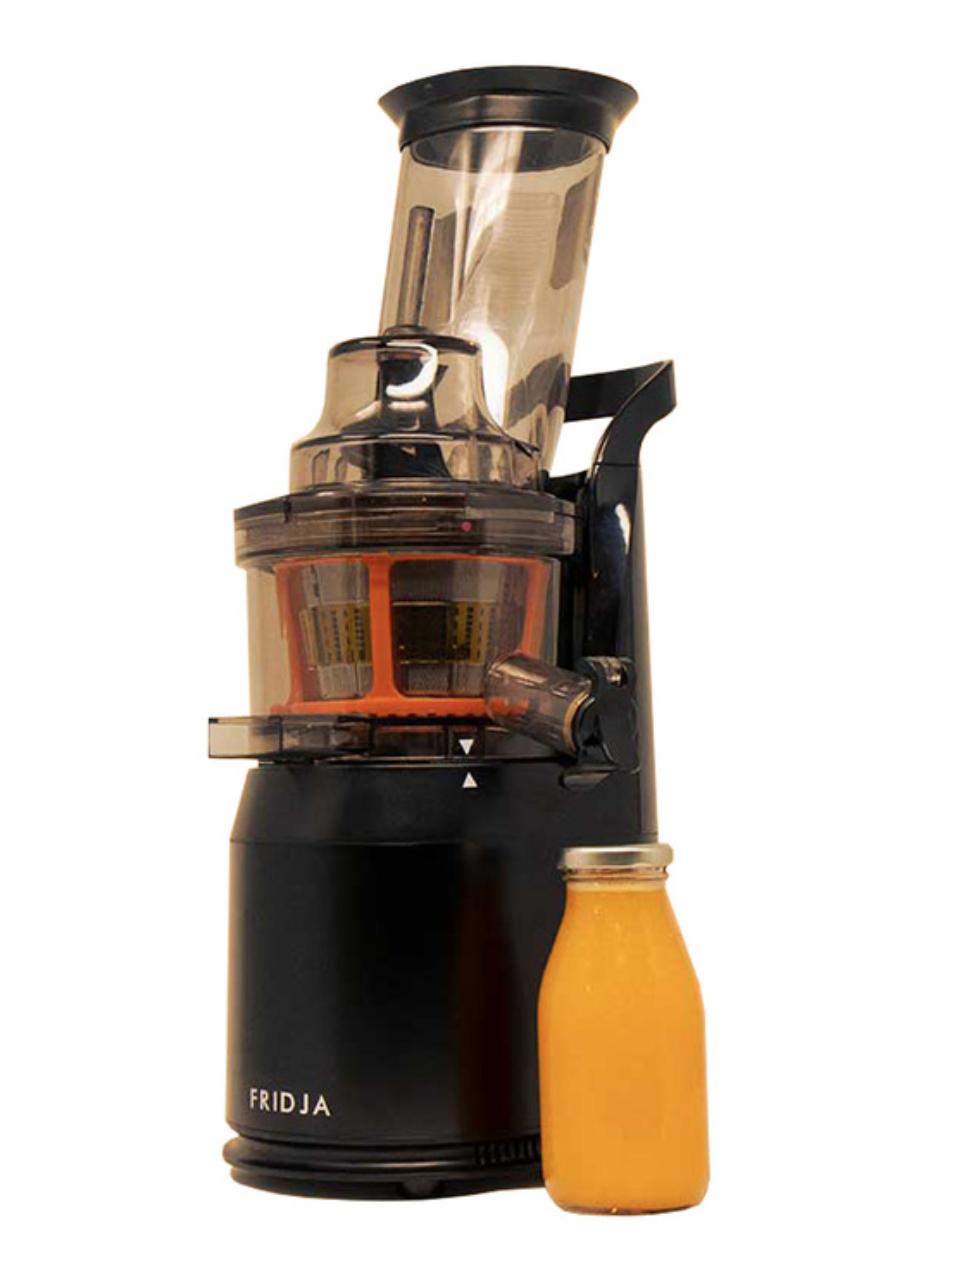 Fridja F1900/Blk Powerful Masticating Juicer - £99.89 delivered @ Costco